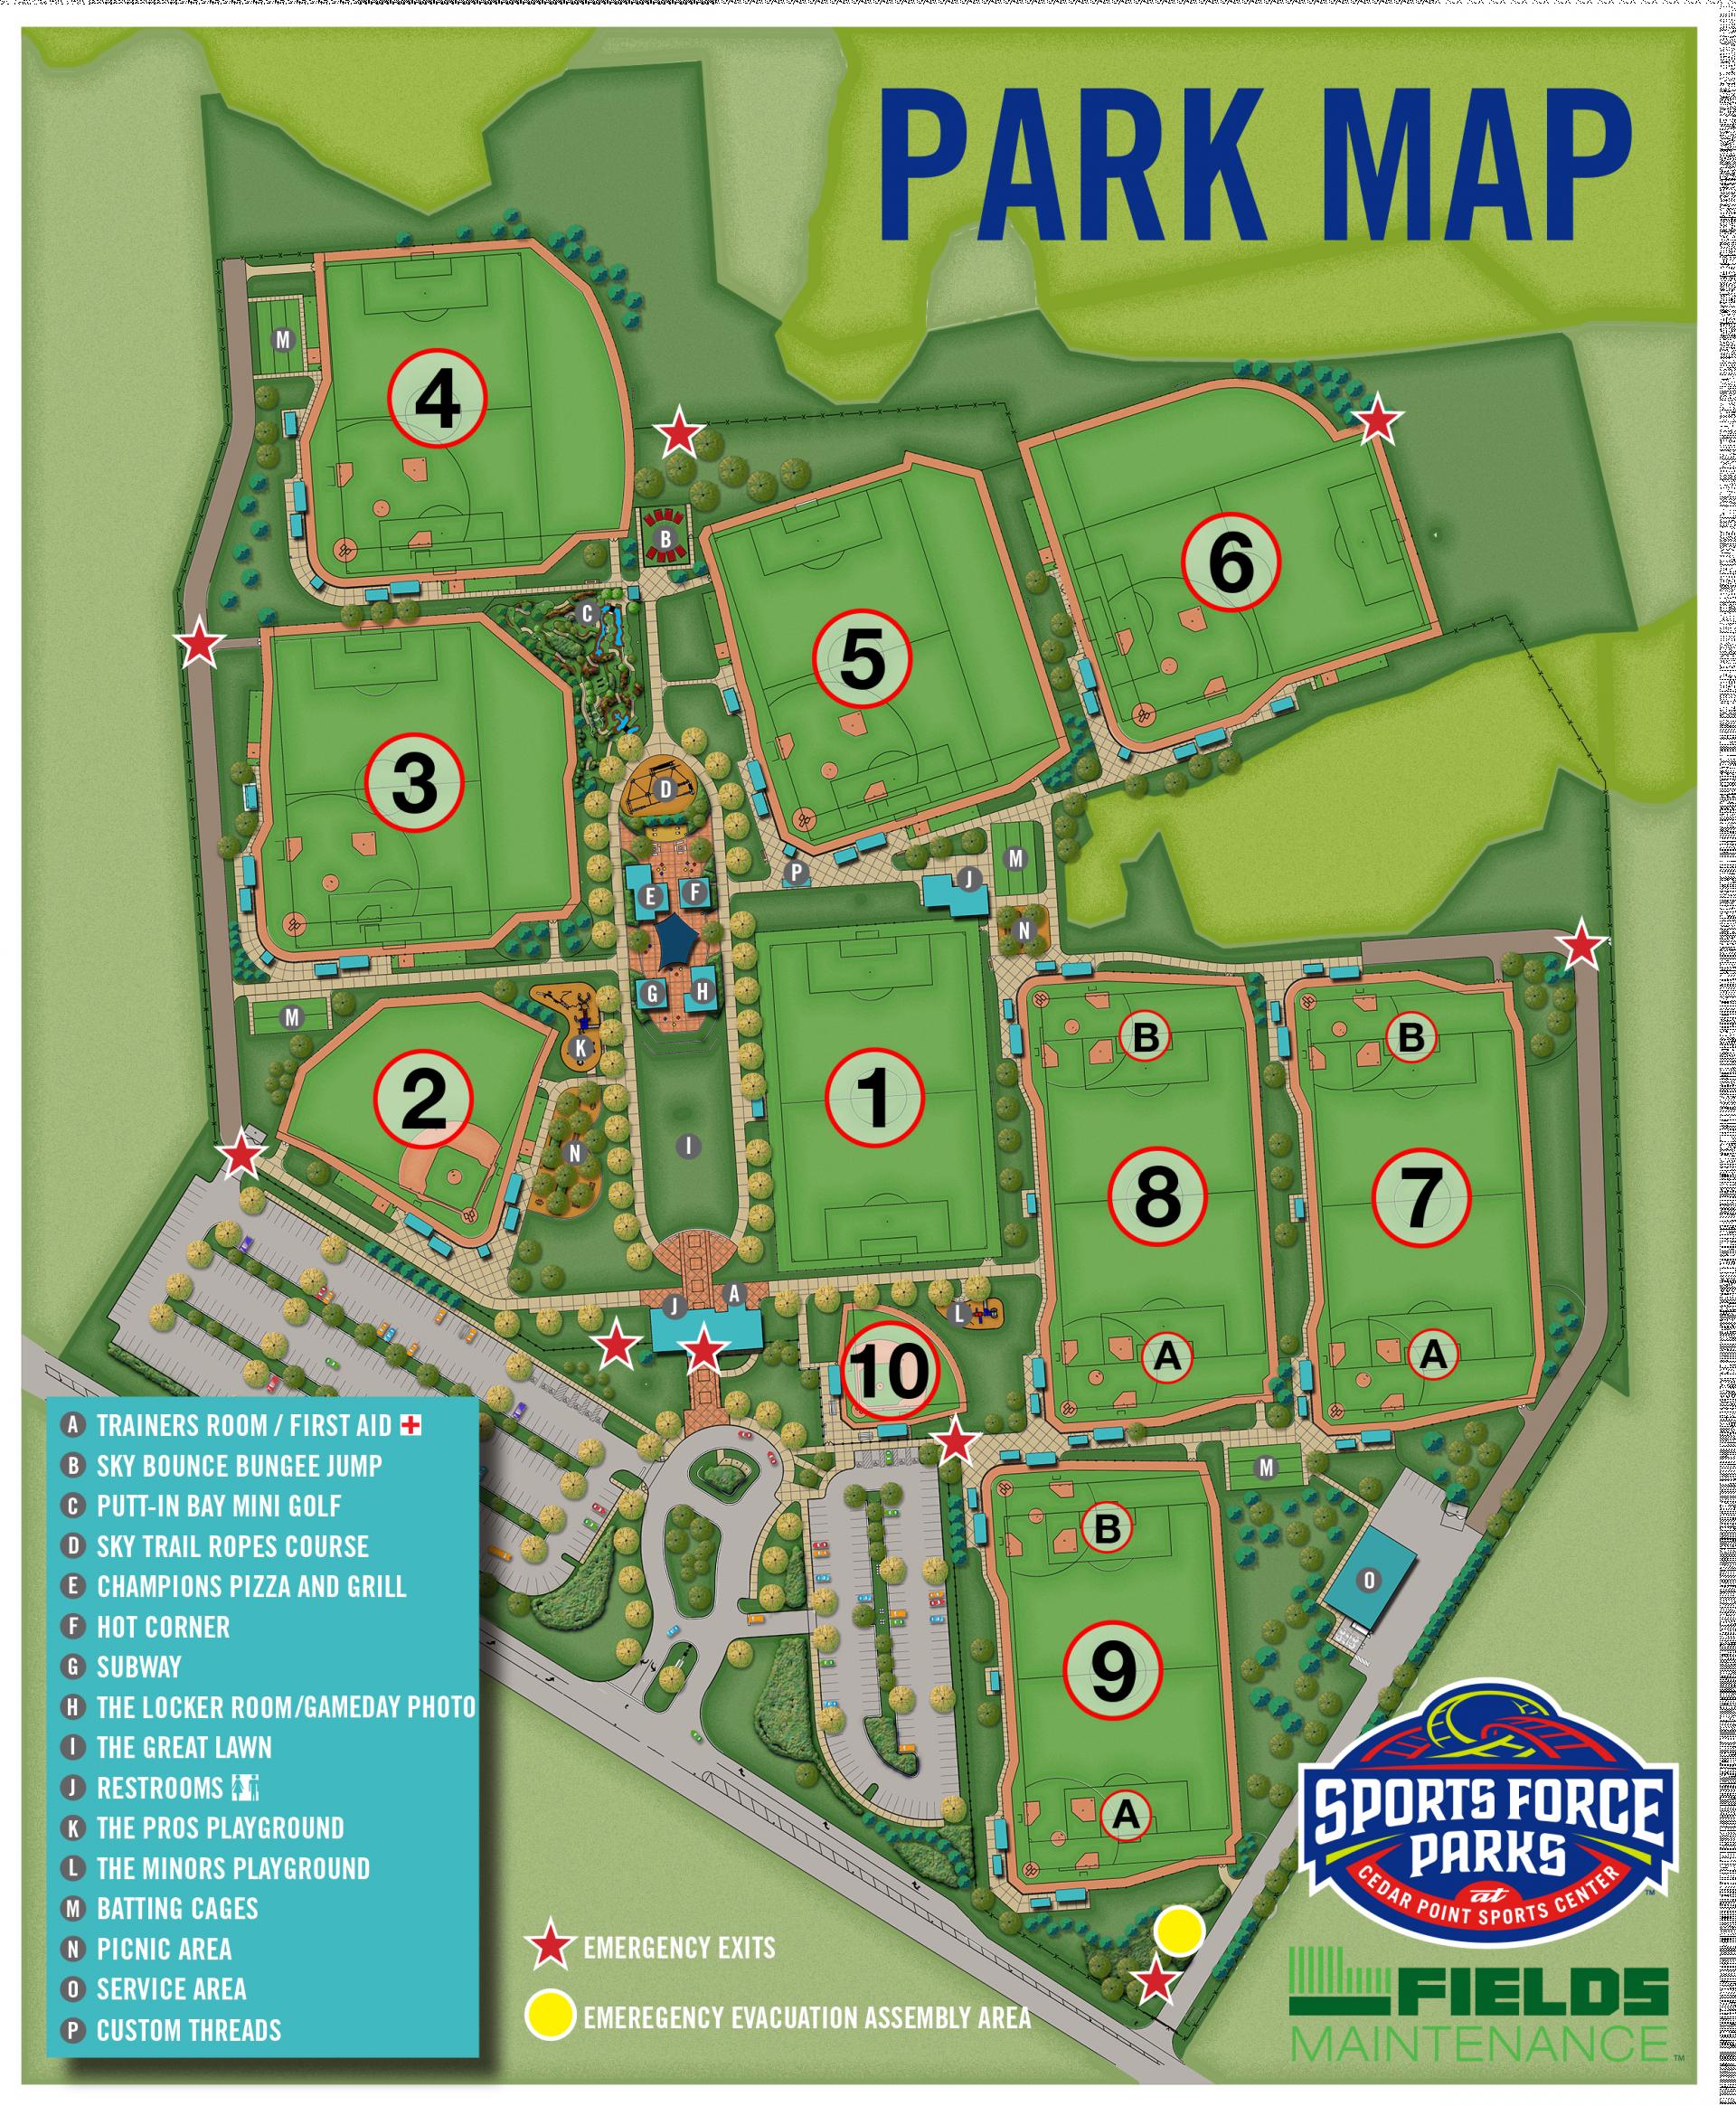 Map Of Us Baseball Parks Park Maps Fort Pulaski National Monument - Us map of baseball stadiums